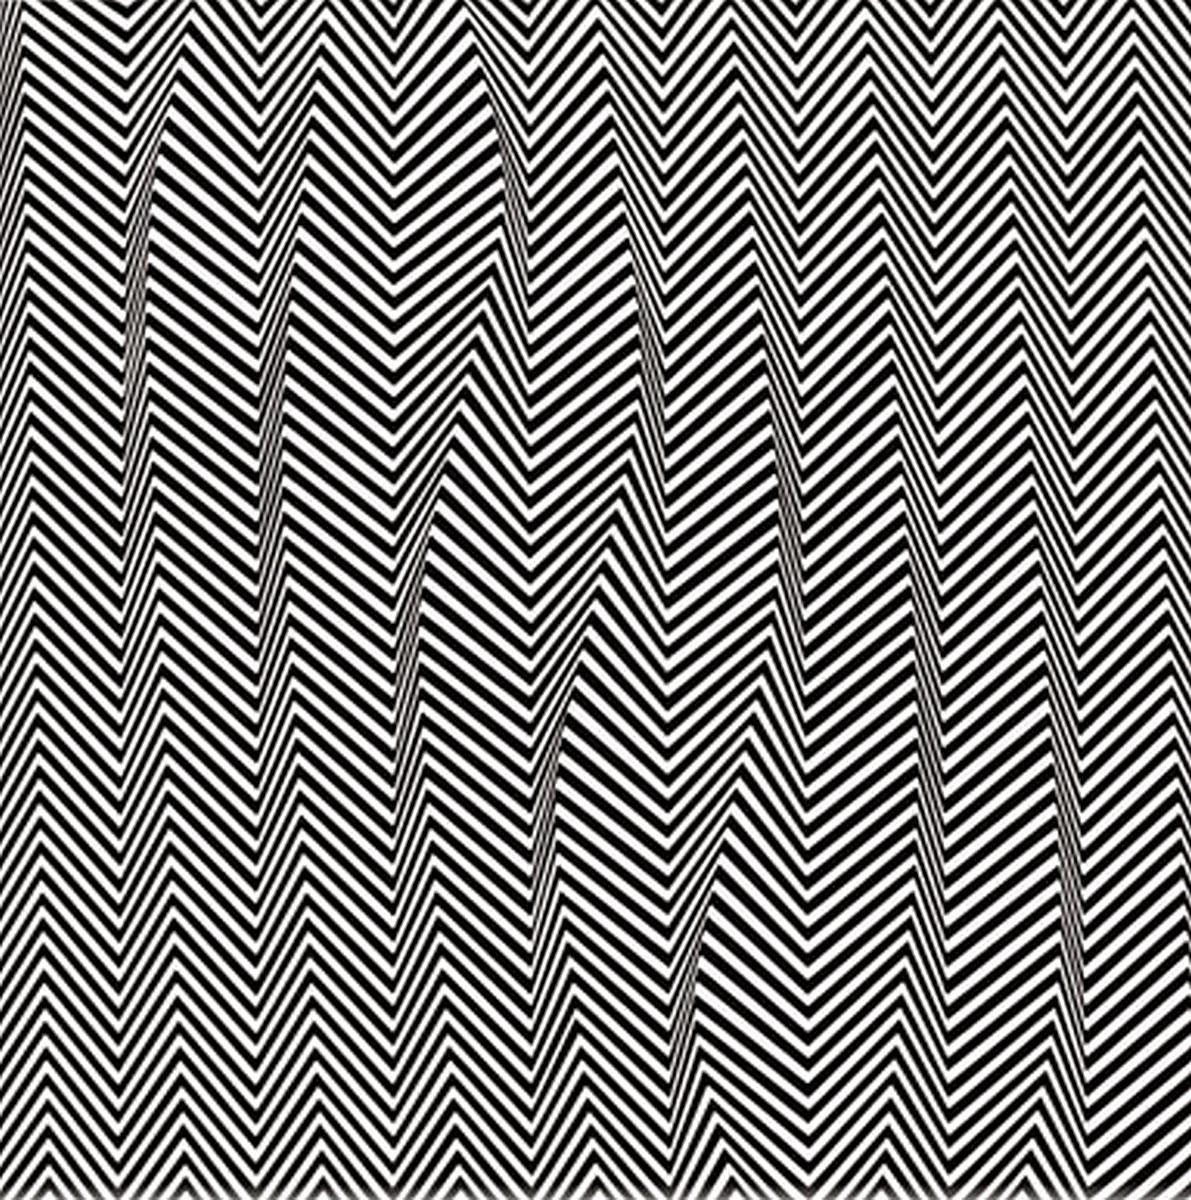 Line In Visual Art : Quot hear this you creators november